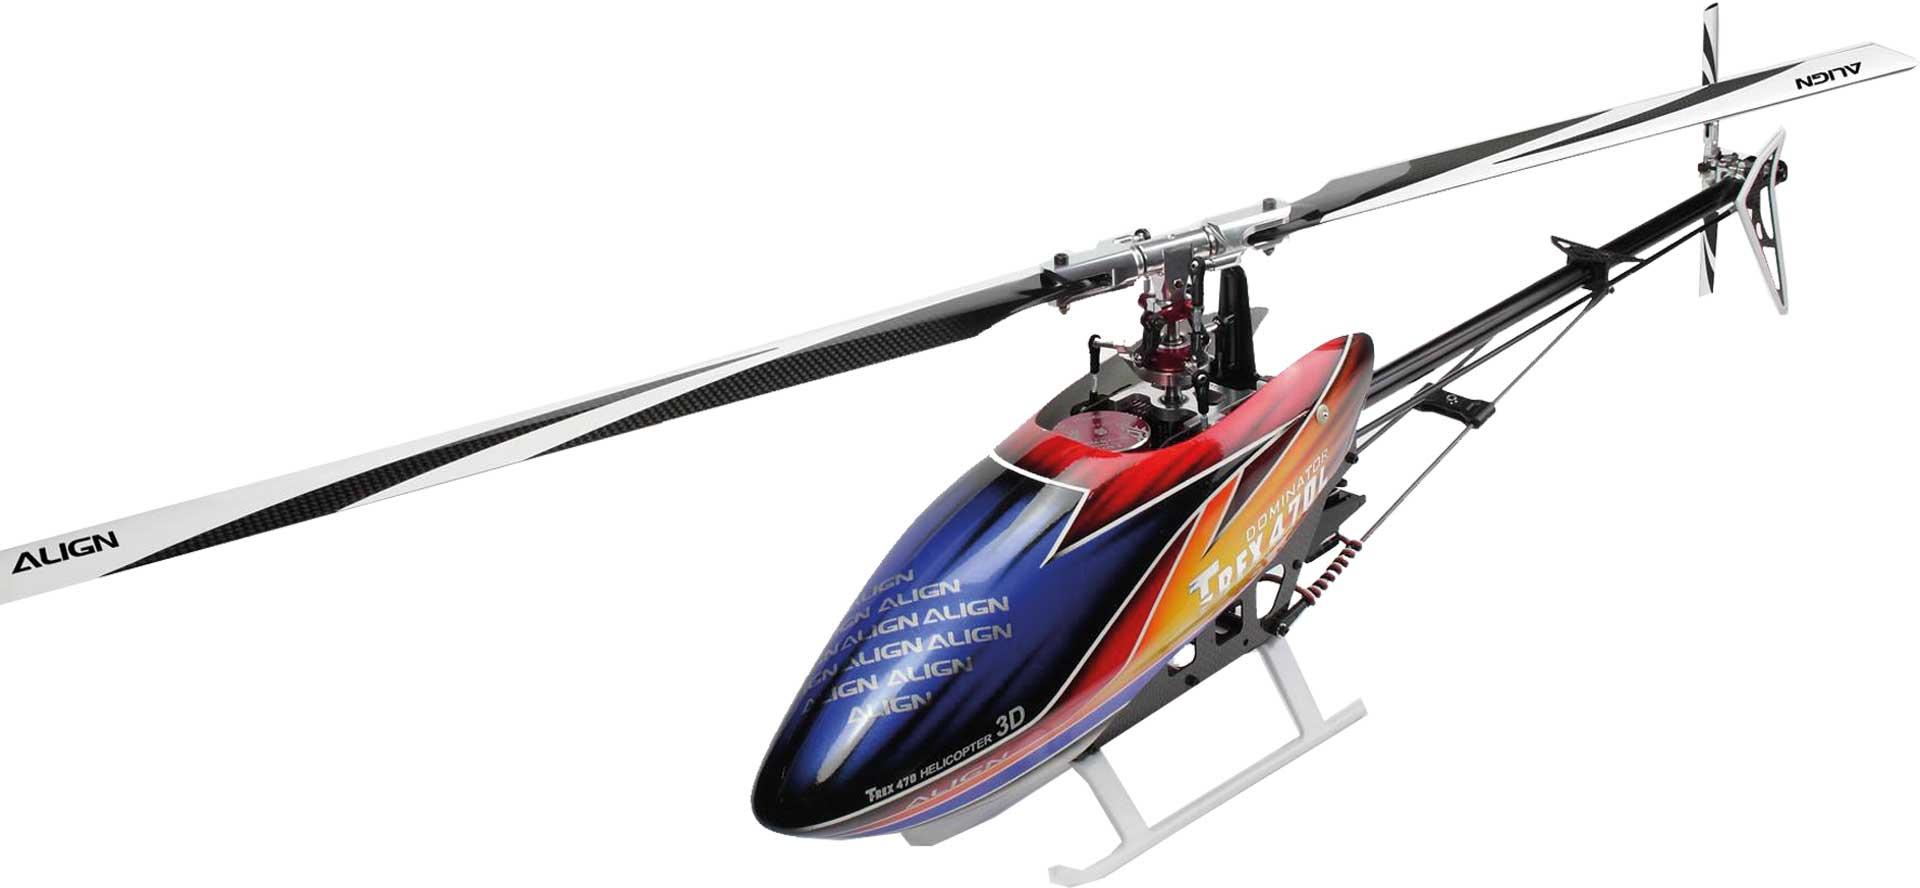 ALIGN T-REX 470LM DOMINATOR KIT Hubschrauber / Helikopter